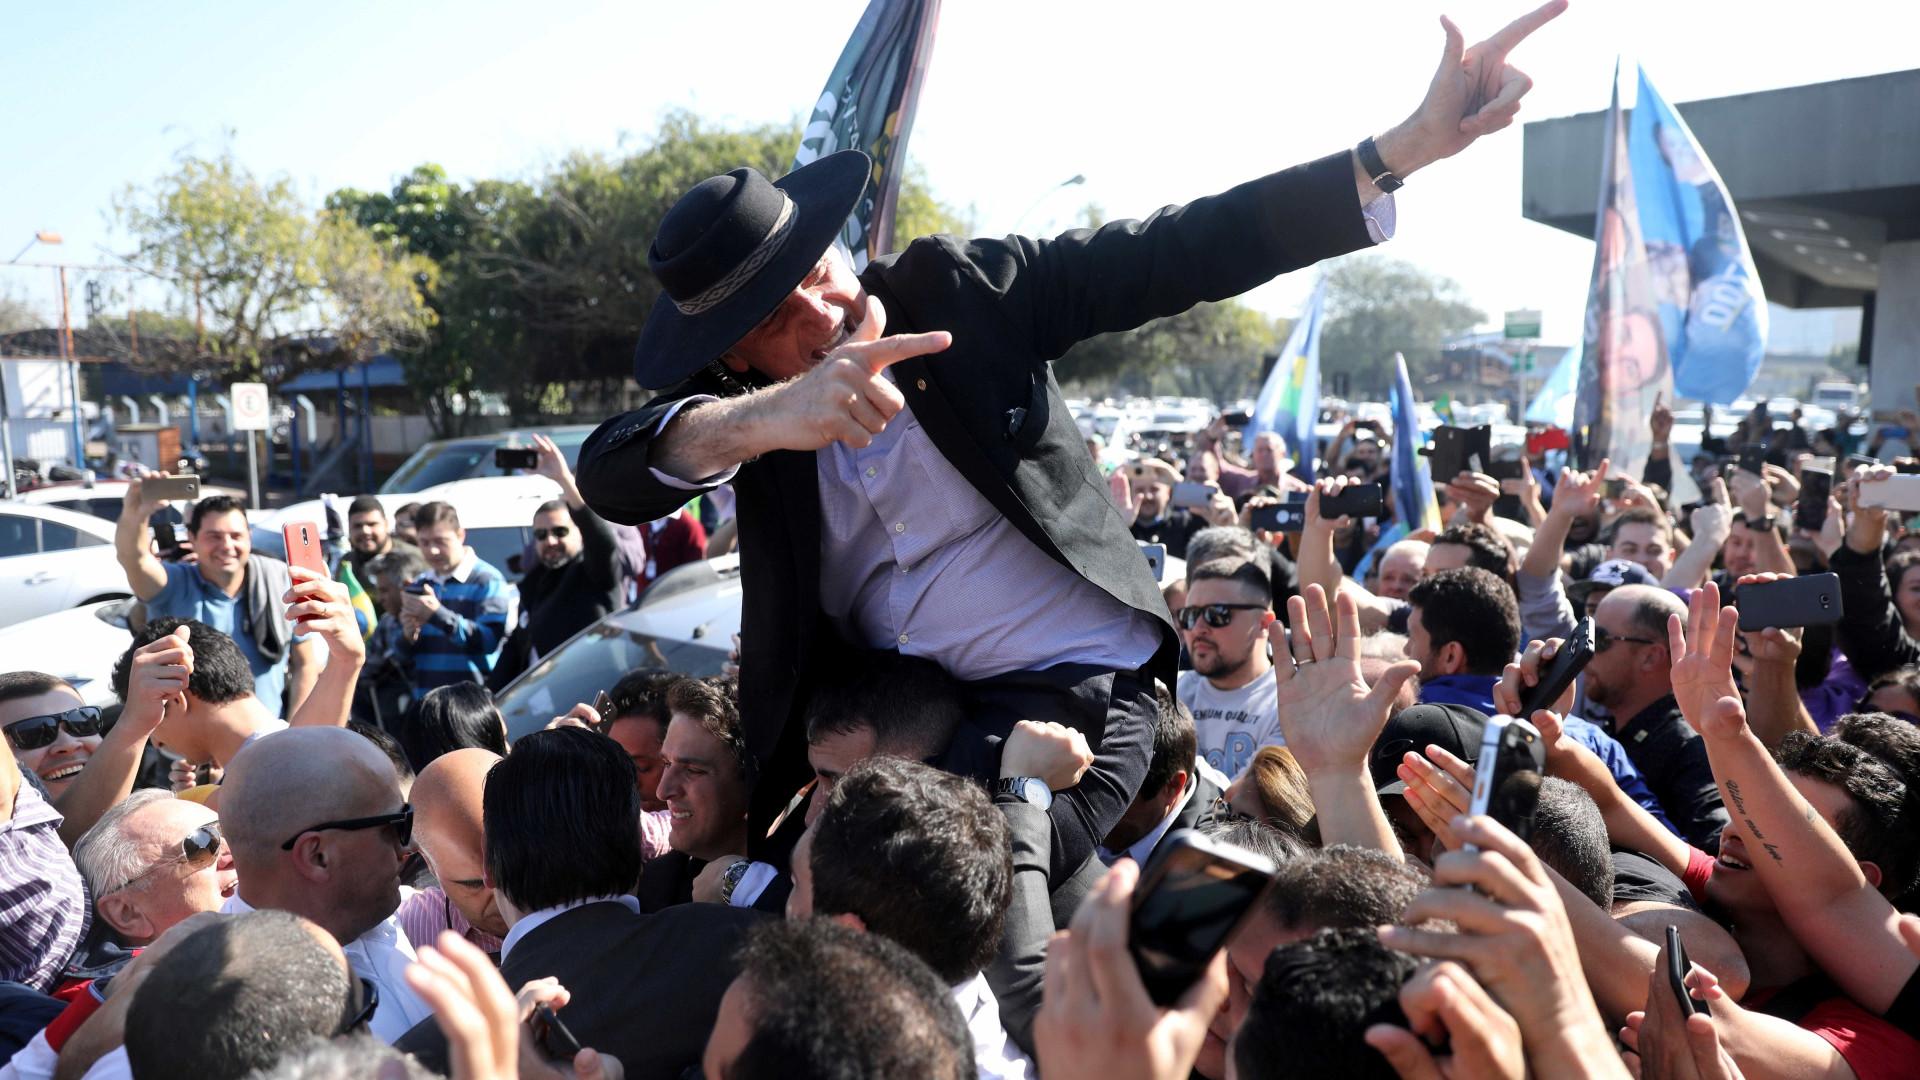 Bolsonaro comete ato falho sobre ataque: 'Sou vítima daquilo que prego'